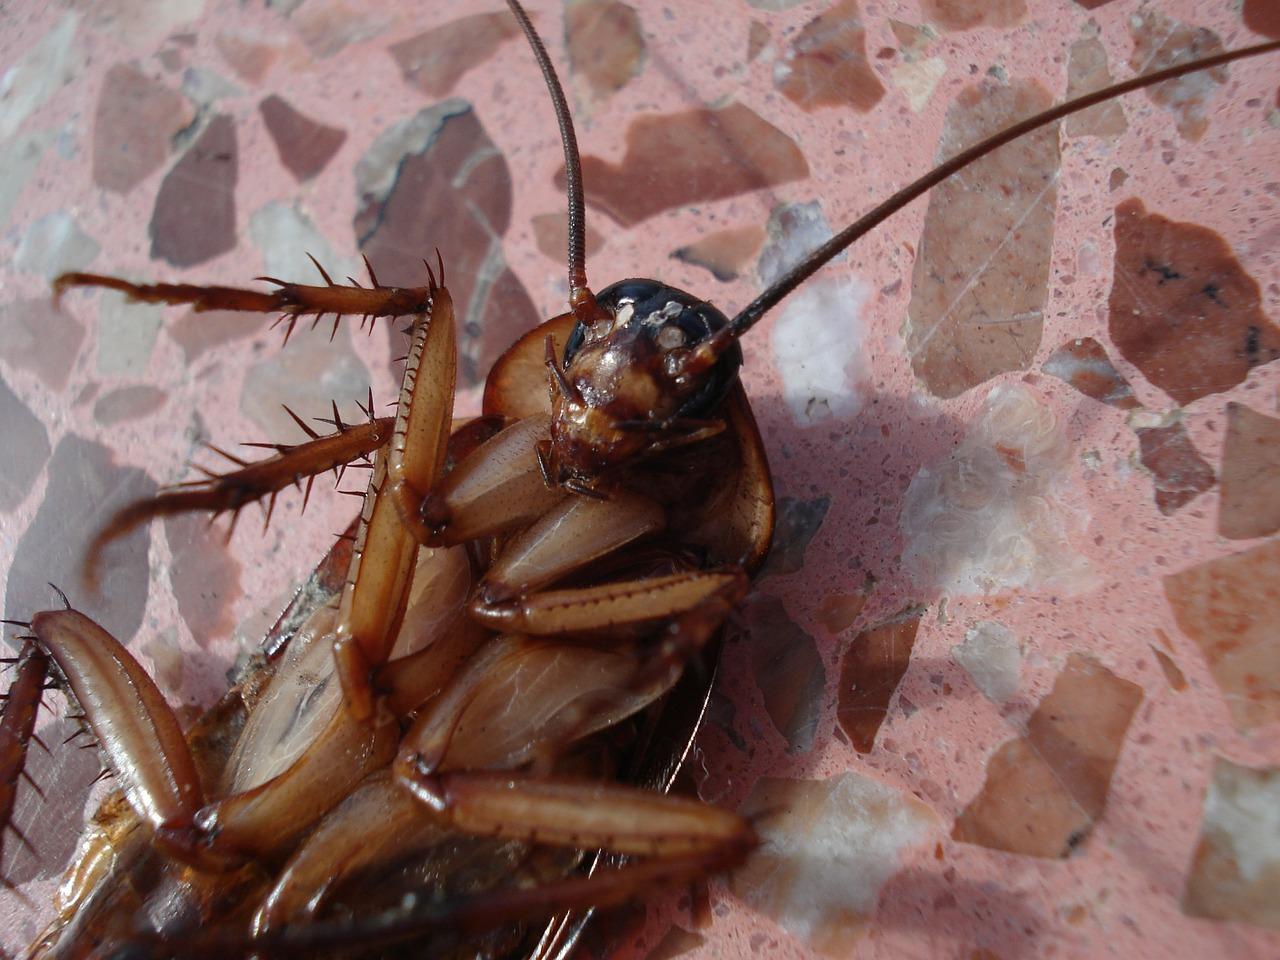 Cucaracha no resiste la radiación de un celular